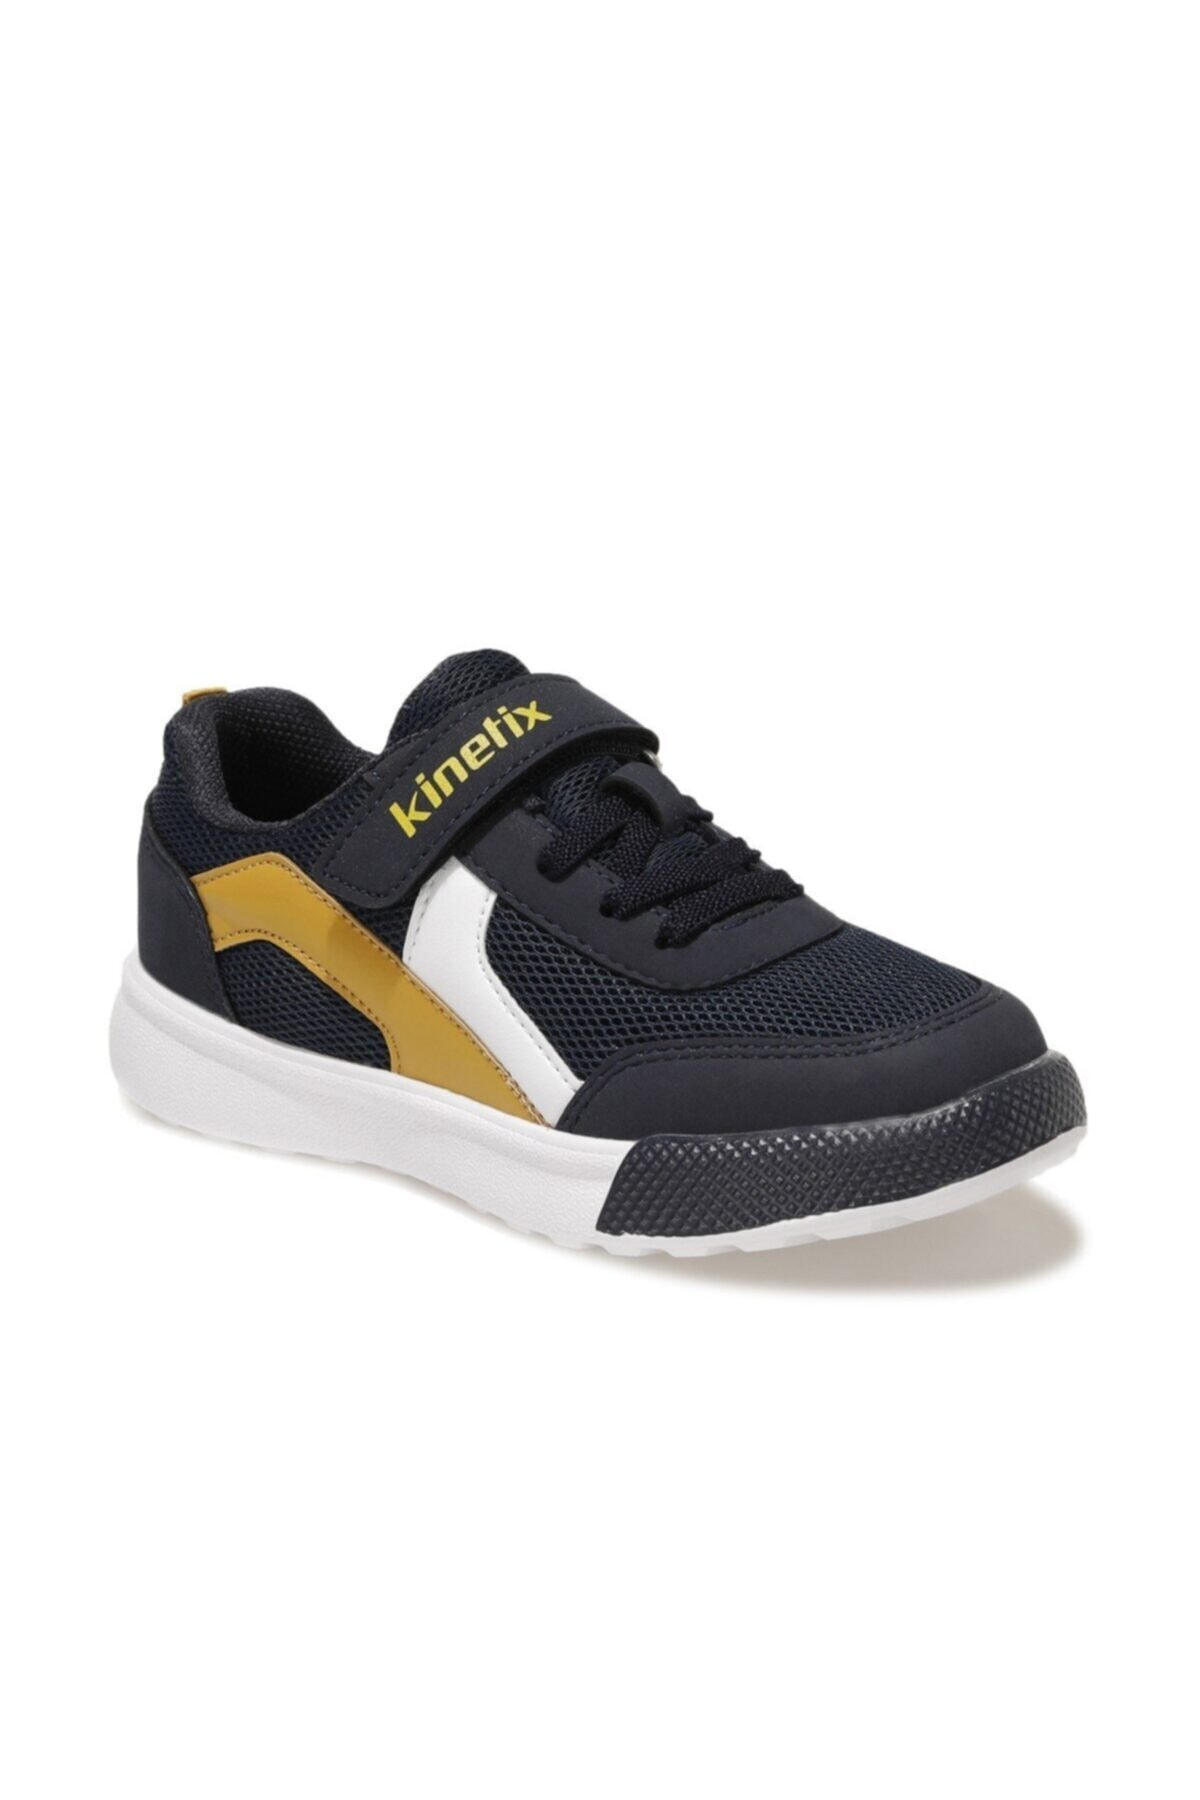 کفش اسپرت بچه گانه پسرانه برند کینتیکس kinetix رنگ لاجوردی کد ty90245773